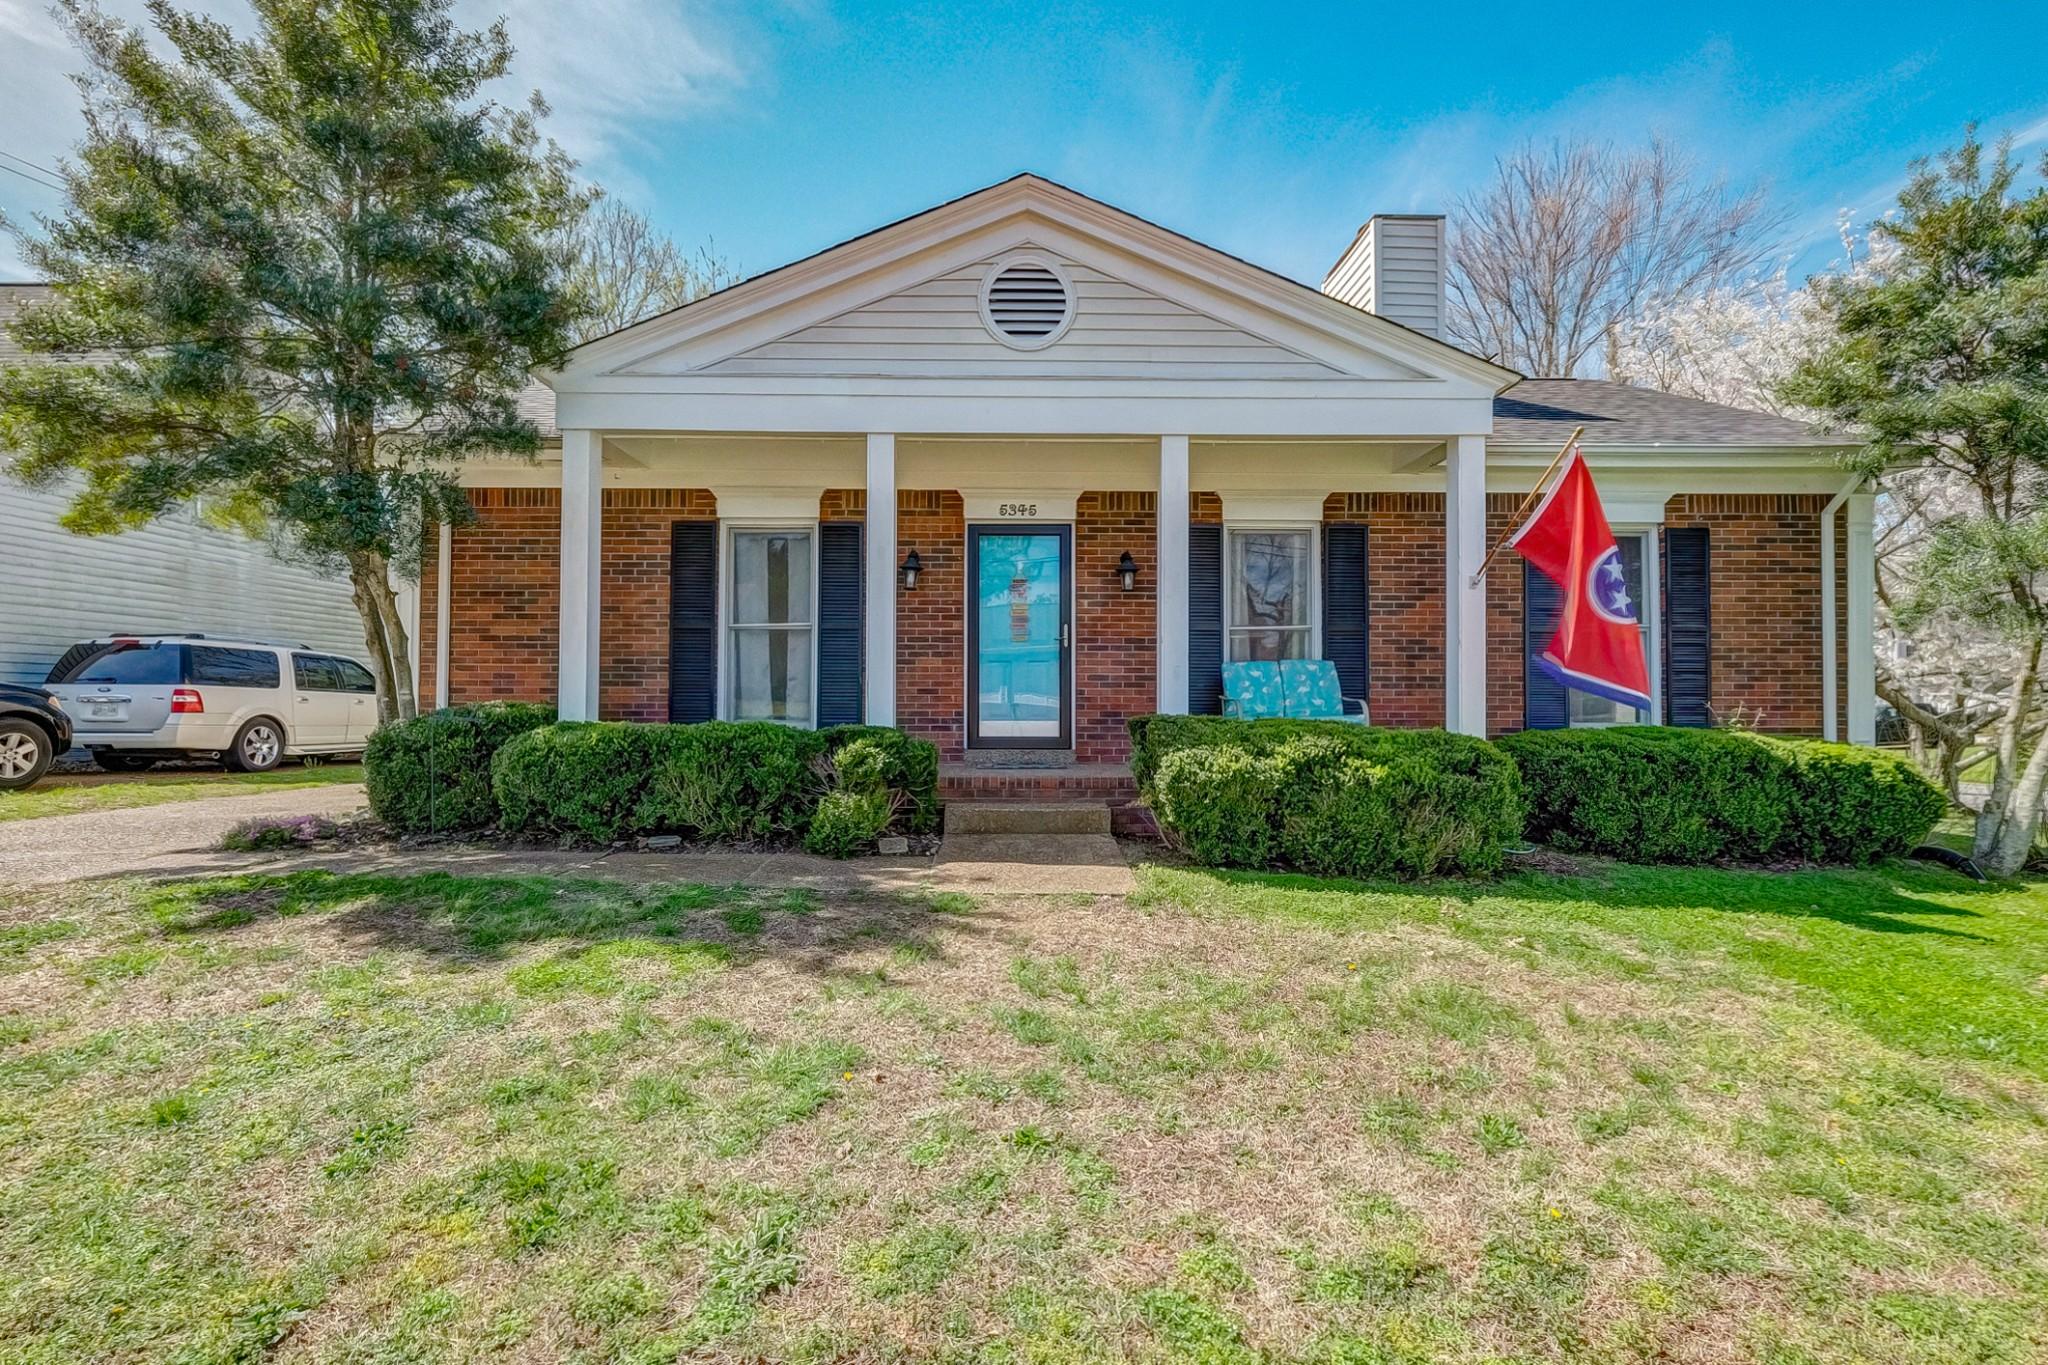 5345 Hunters Rdg, Nashville, TN 37211 - Nashville, TN real estate listing